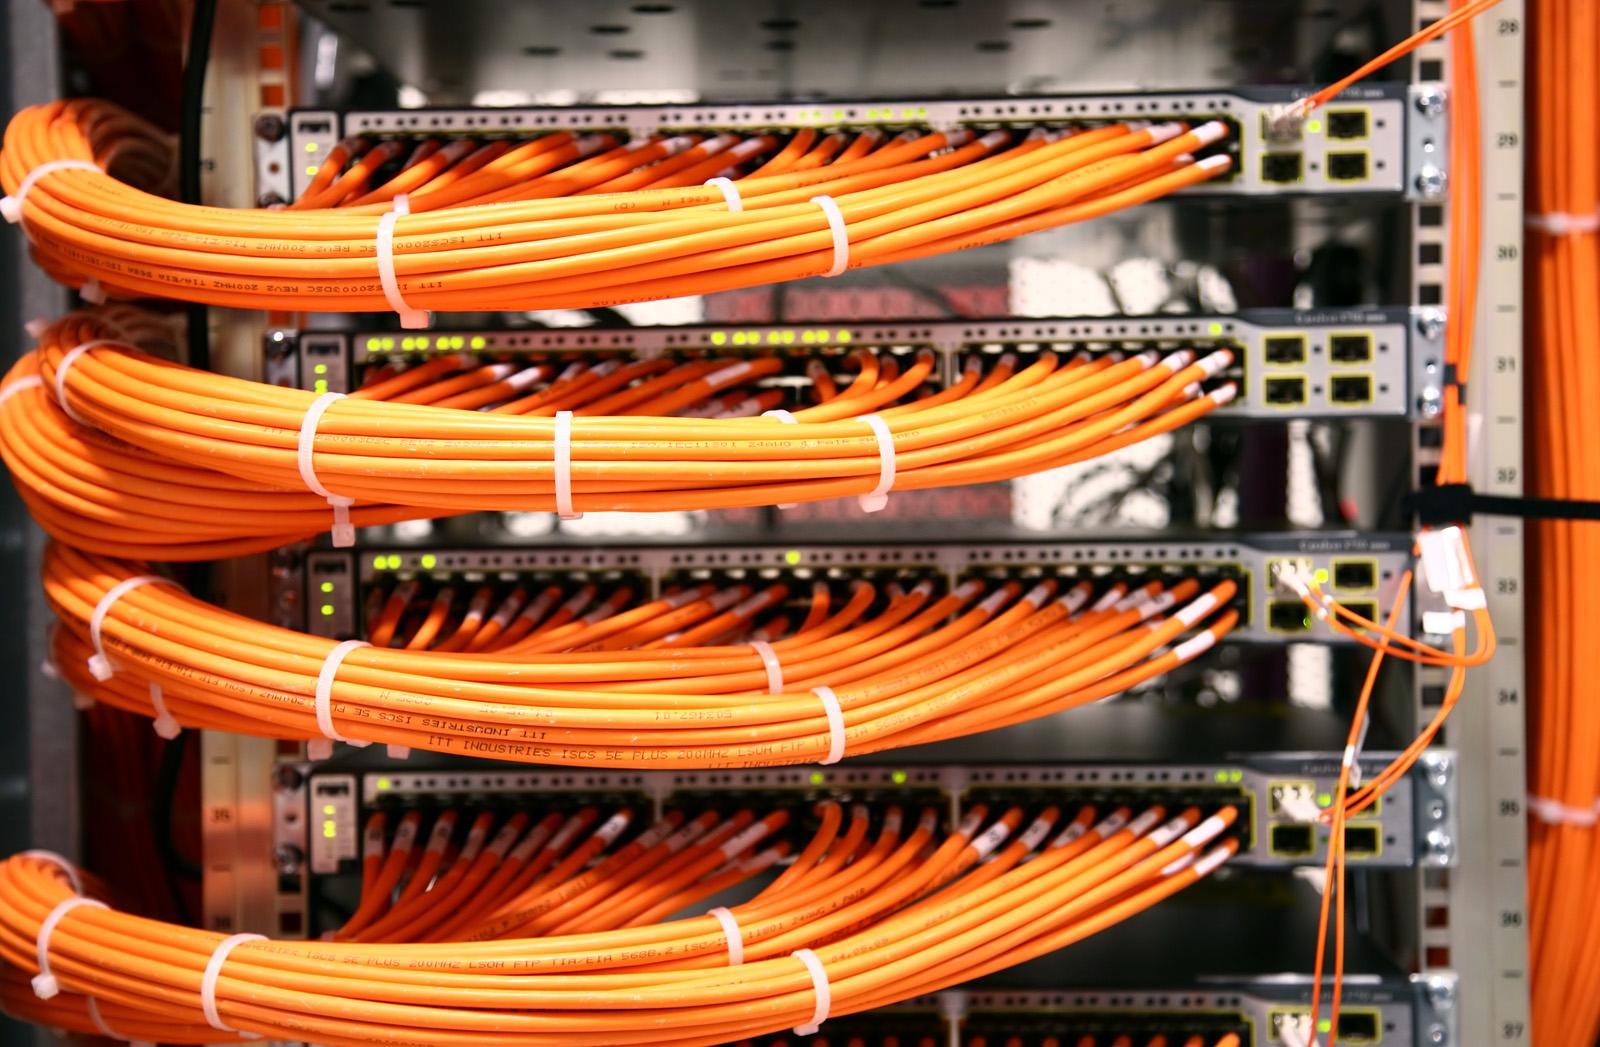 Vanceburg Kentucky Premier Voice & Data Network Cabling Services